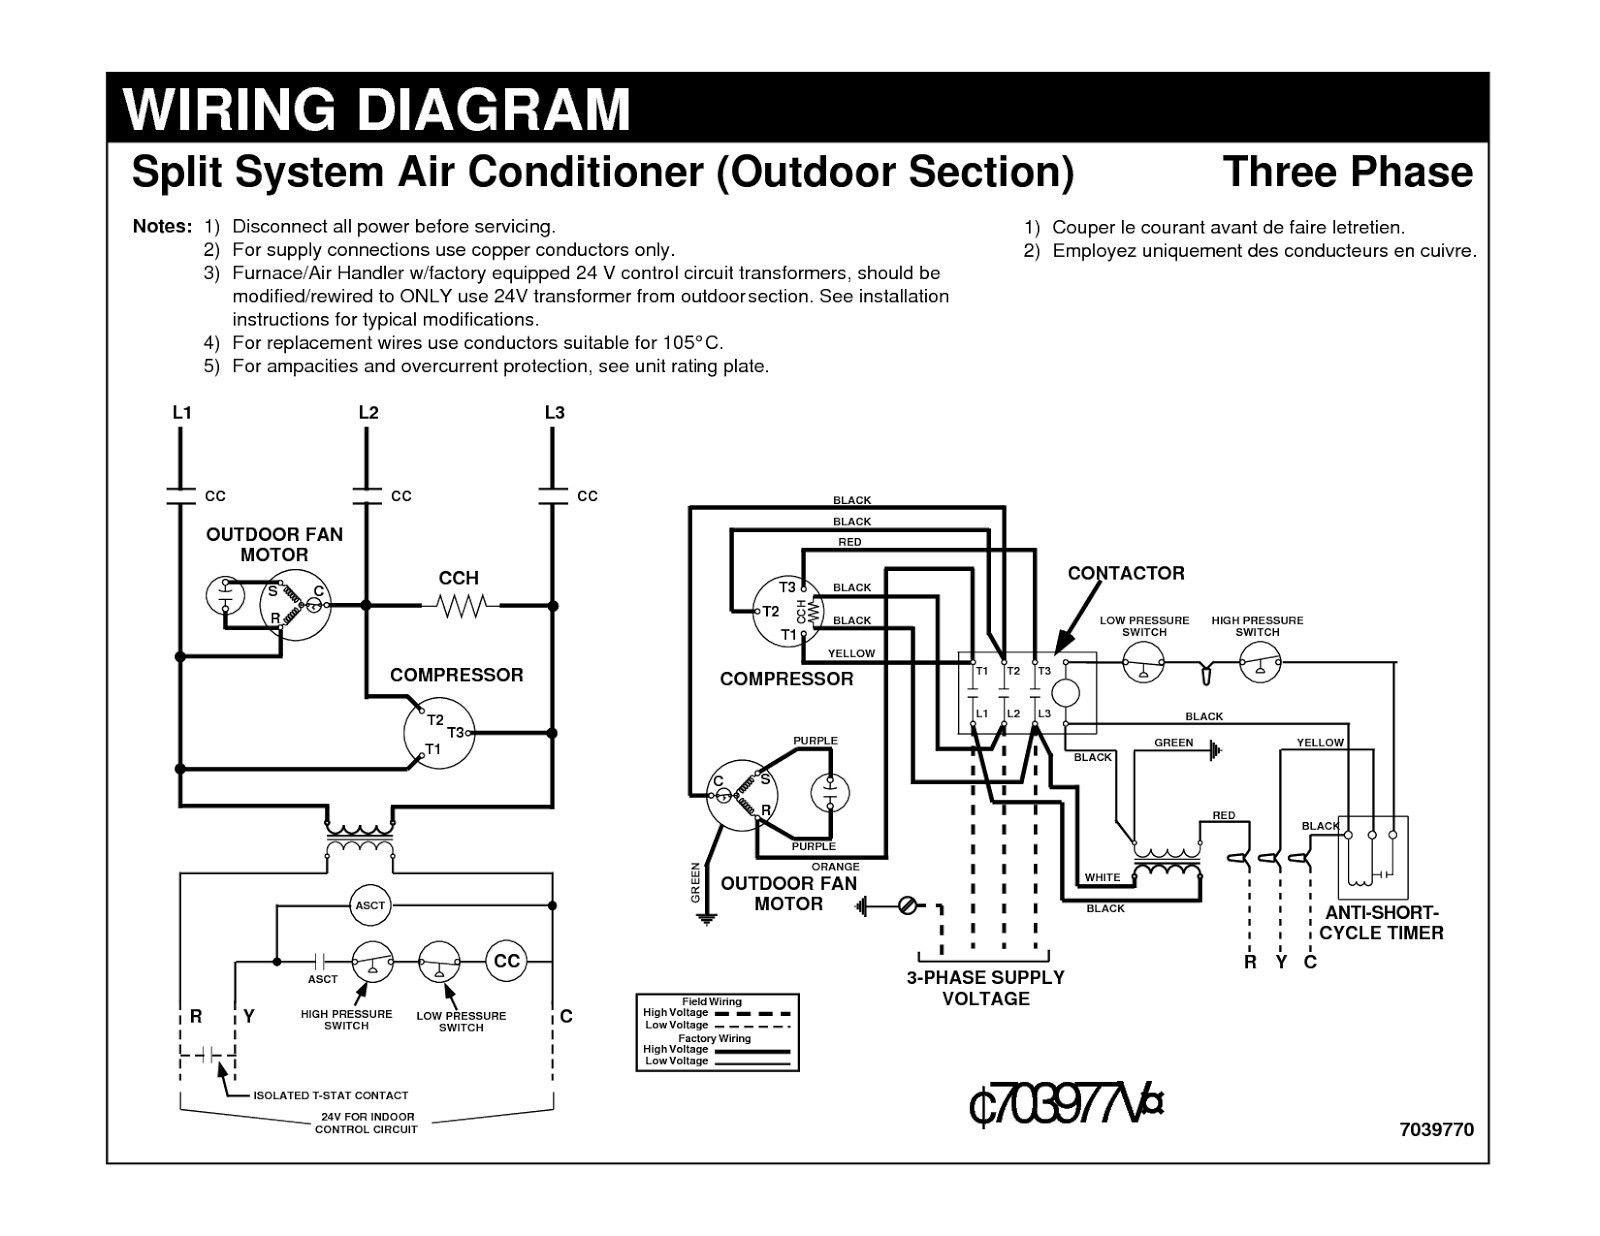 Pin by John Houston on Wiring Diagram Sample in 2019 ... Ac Dual Capacitor Wiring Diagram on